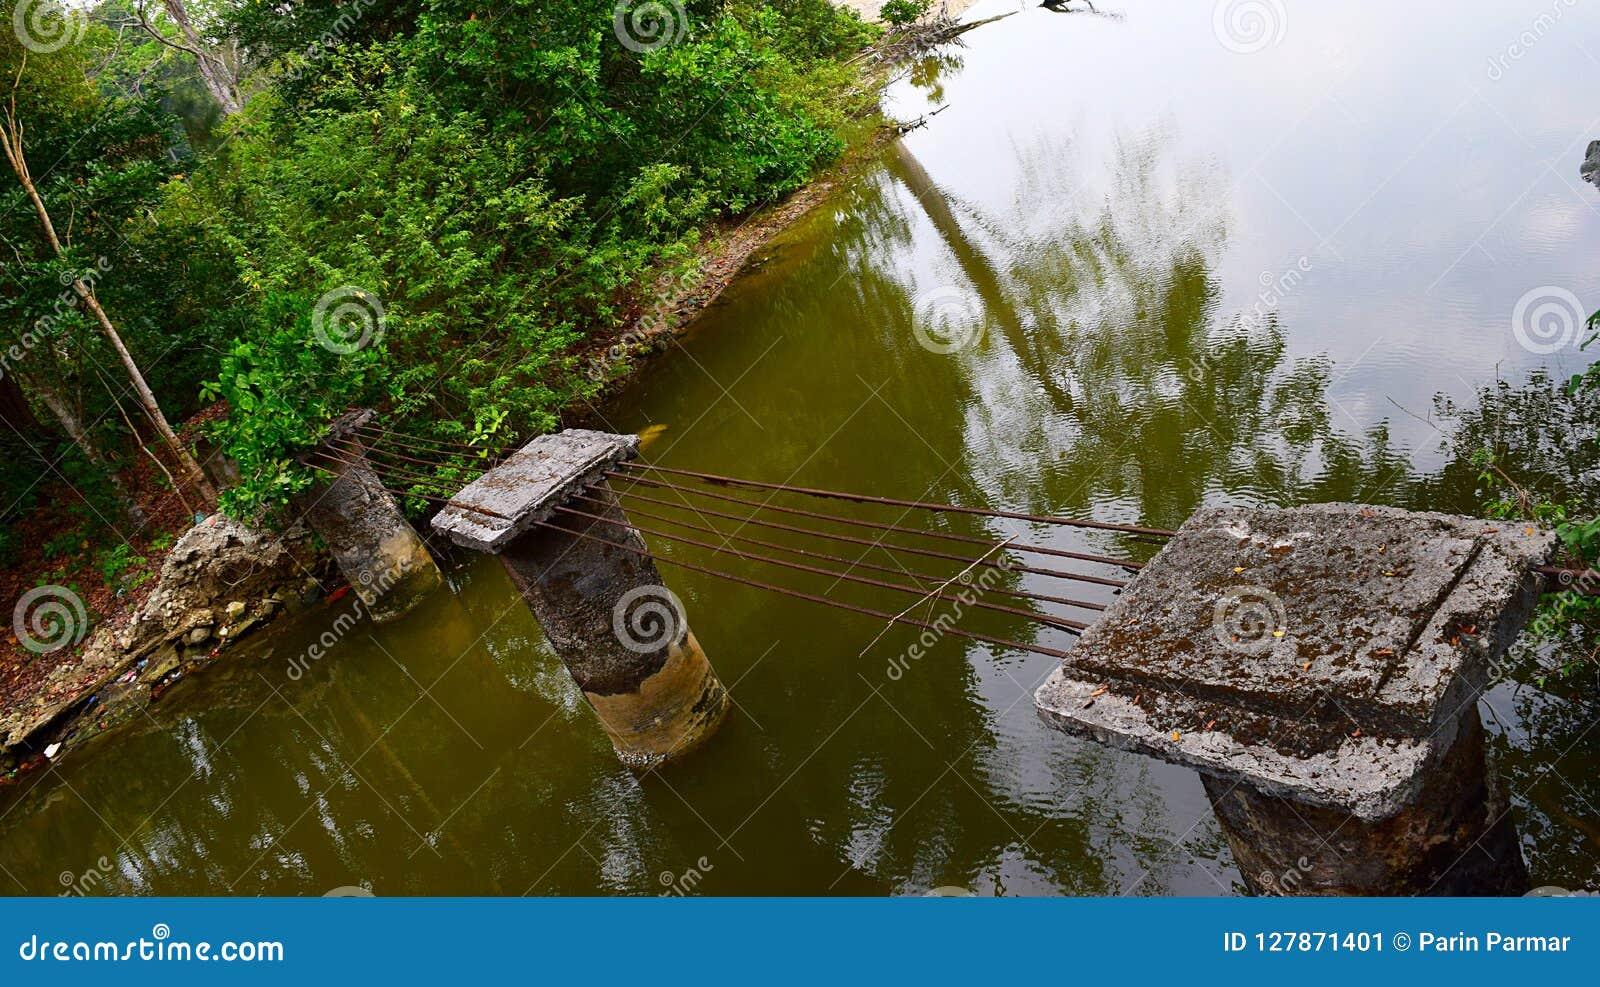 Damaged and Destroyed Bridge following Tsumani - Natural Disaster